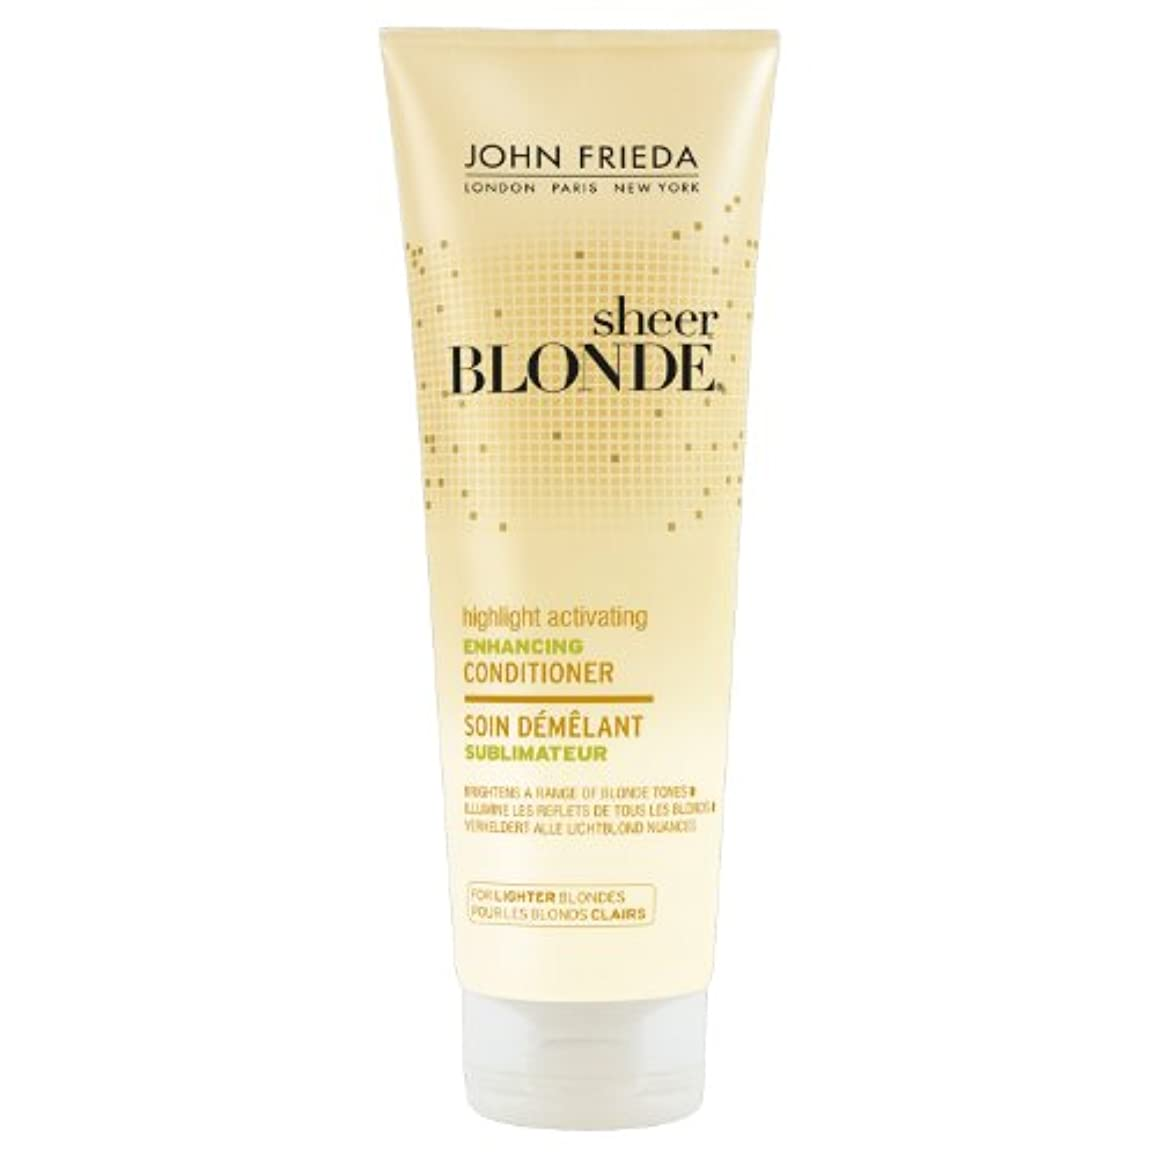 John Frieda Sheer Blonde Highlight Activating Enhancing Conditioner for Lighter Blondes 250ml